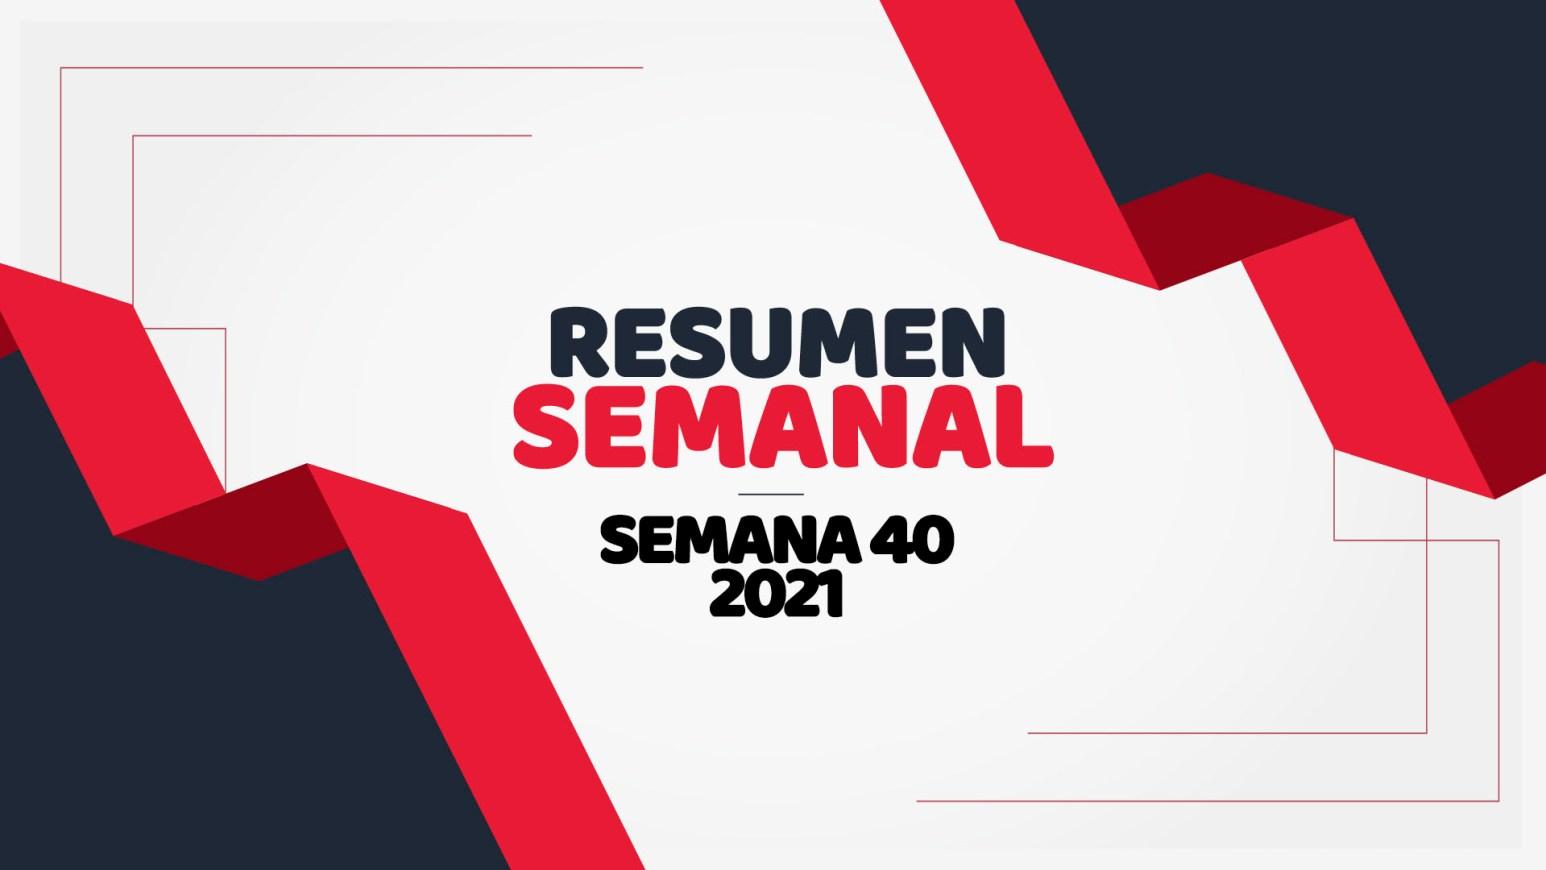 semana 40 de 2021